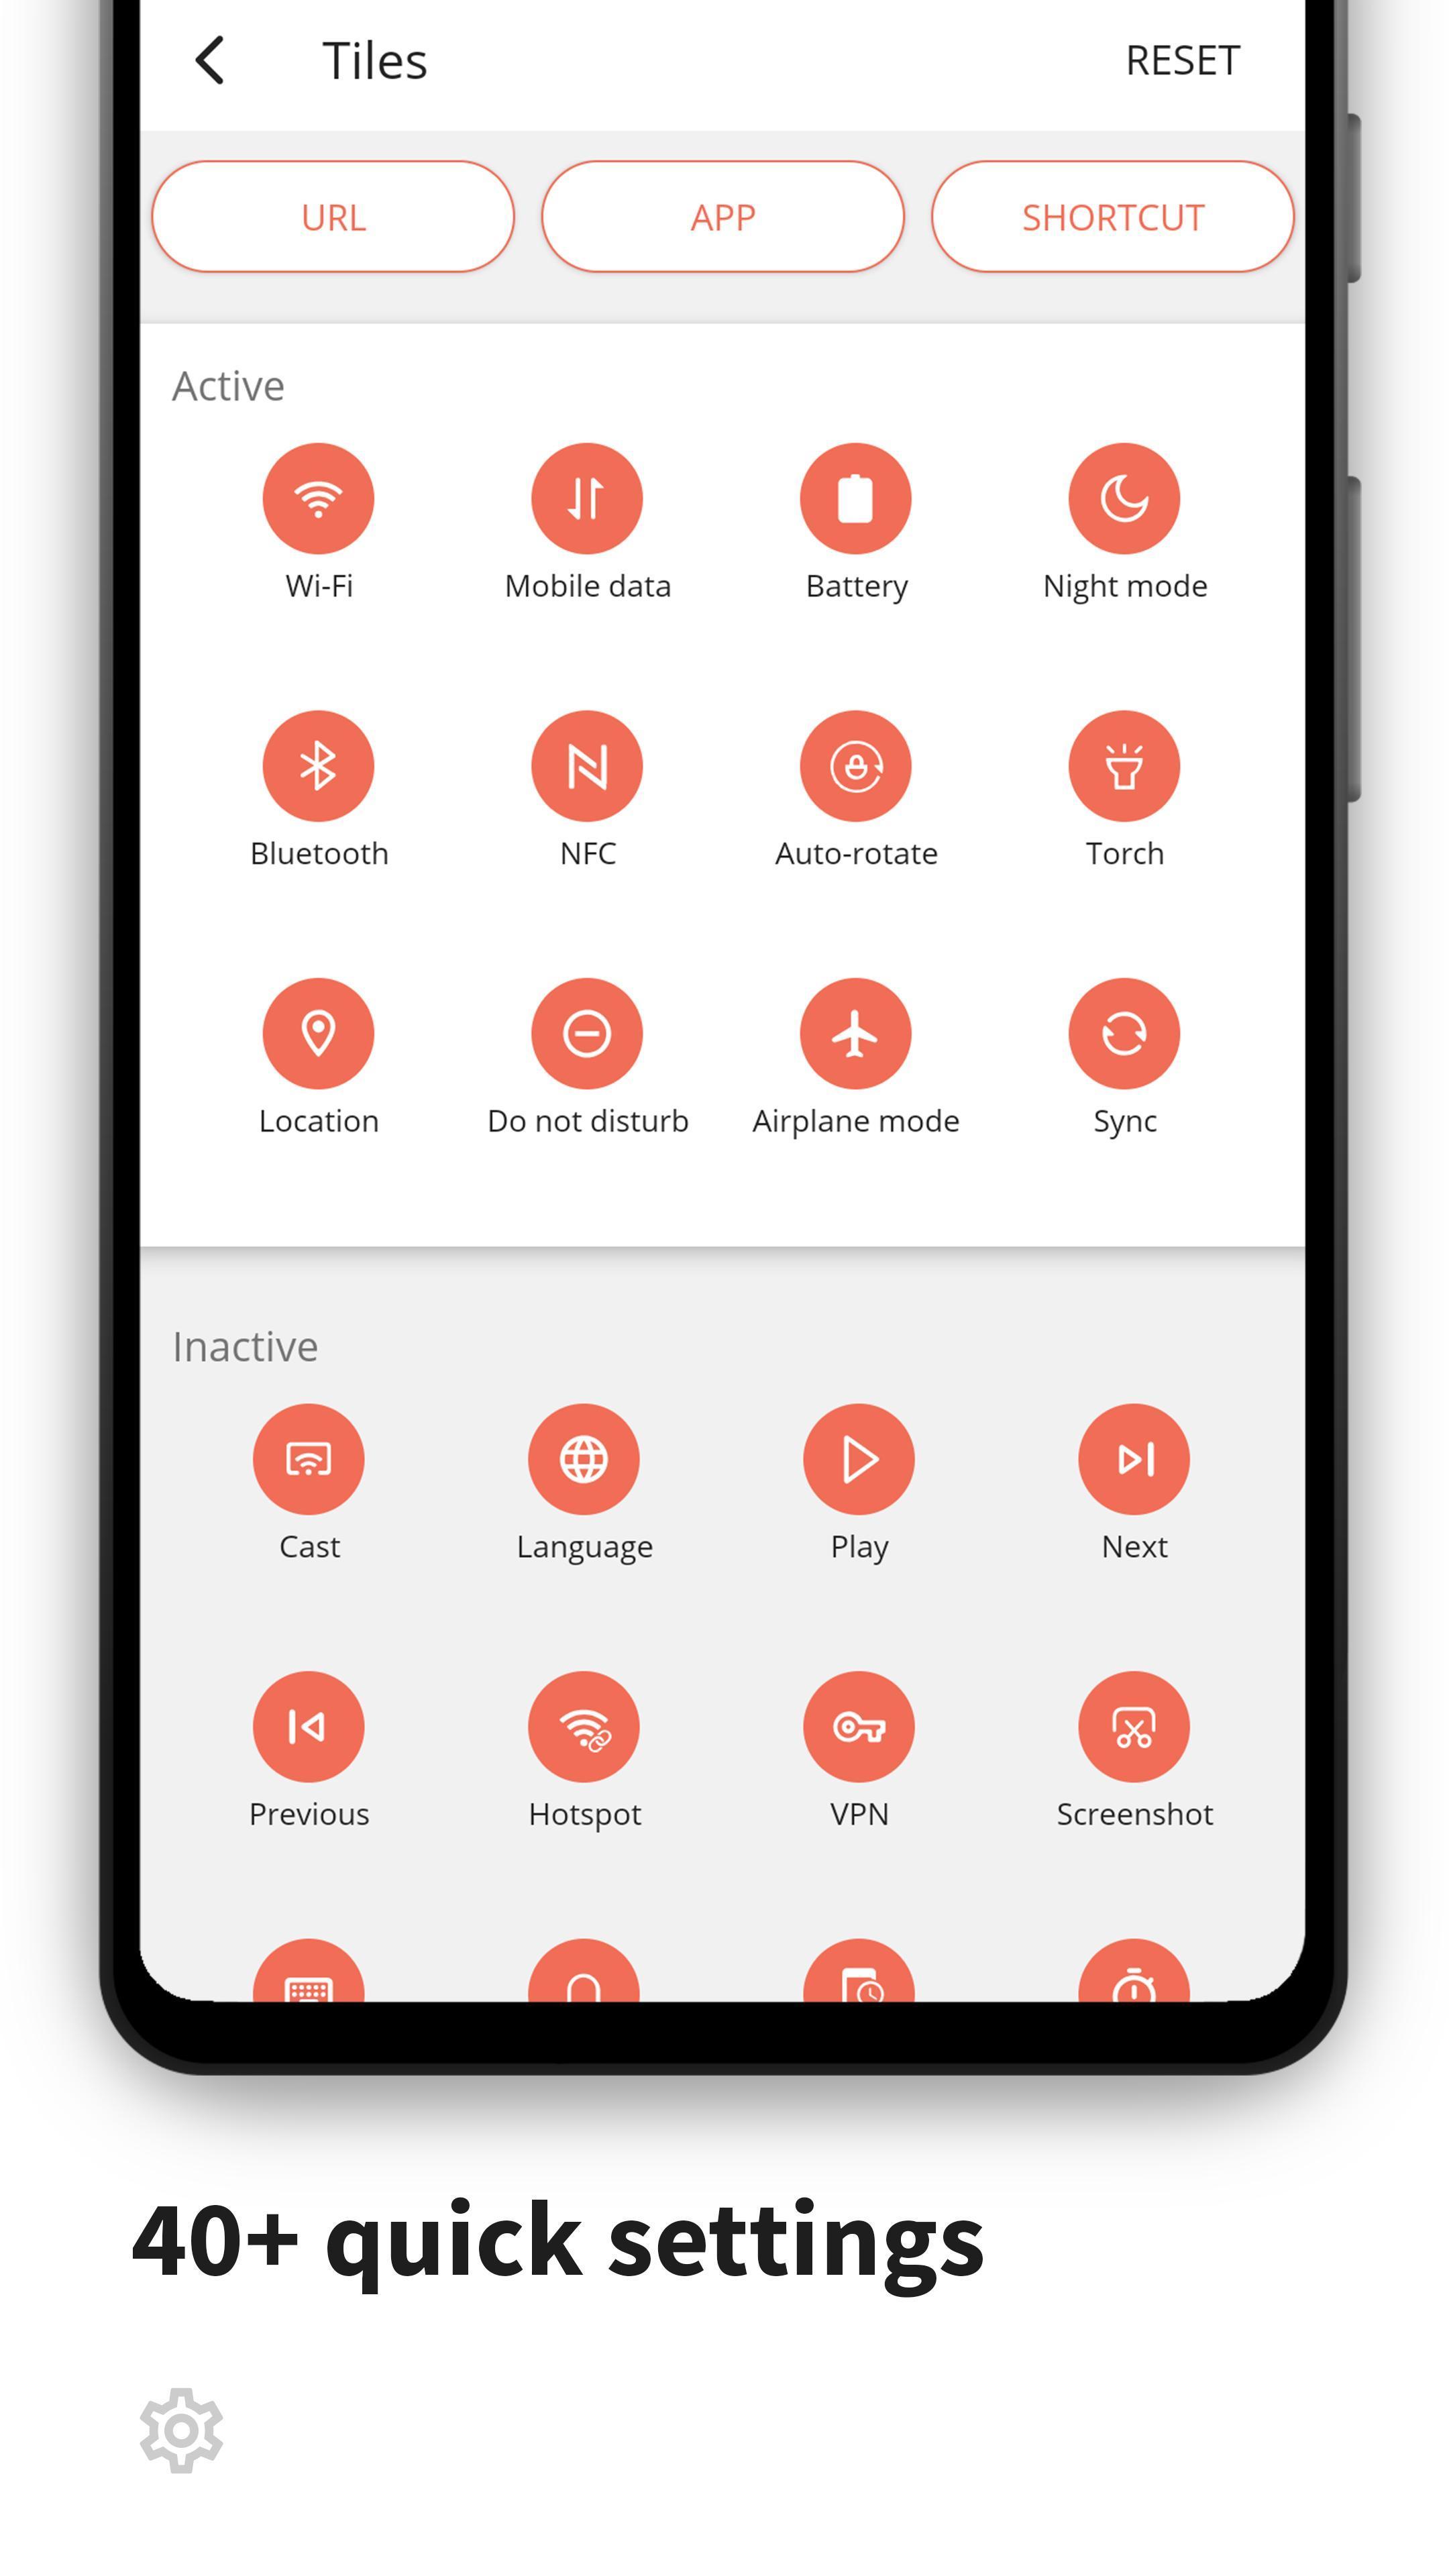 MIUI-ify Notification Shade & Quick Settings 1.7.0 Screenshot 19